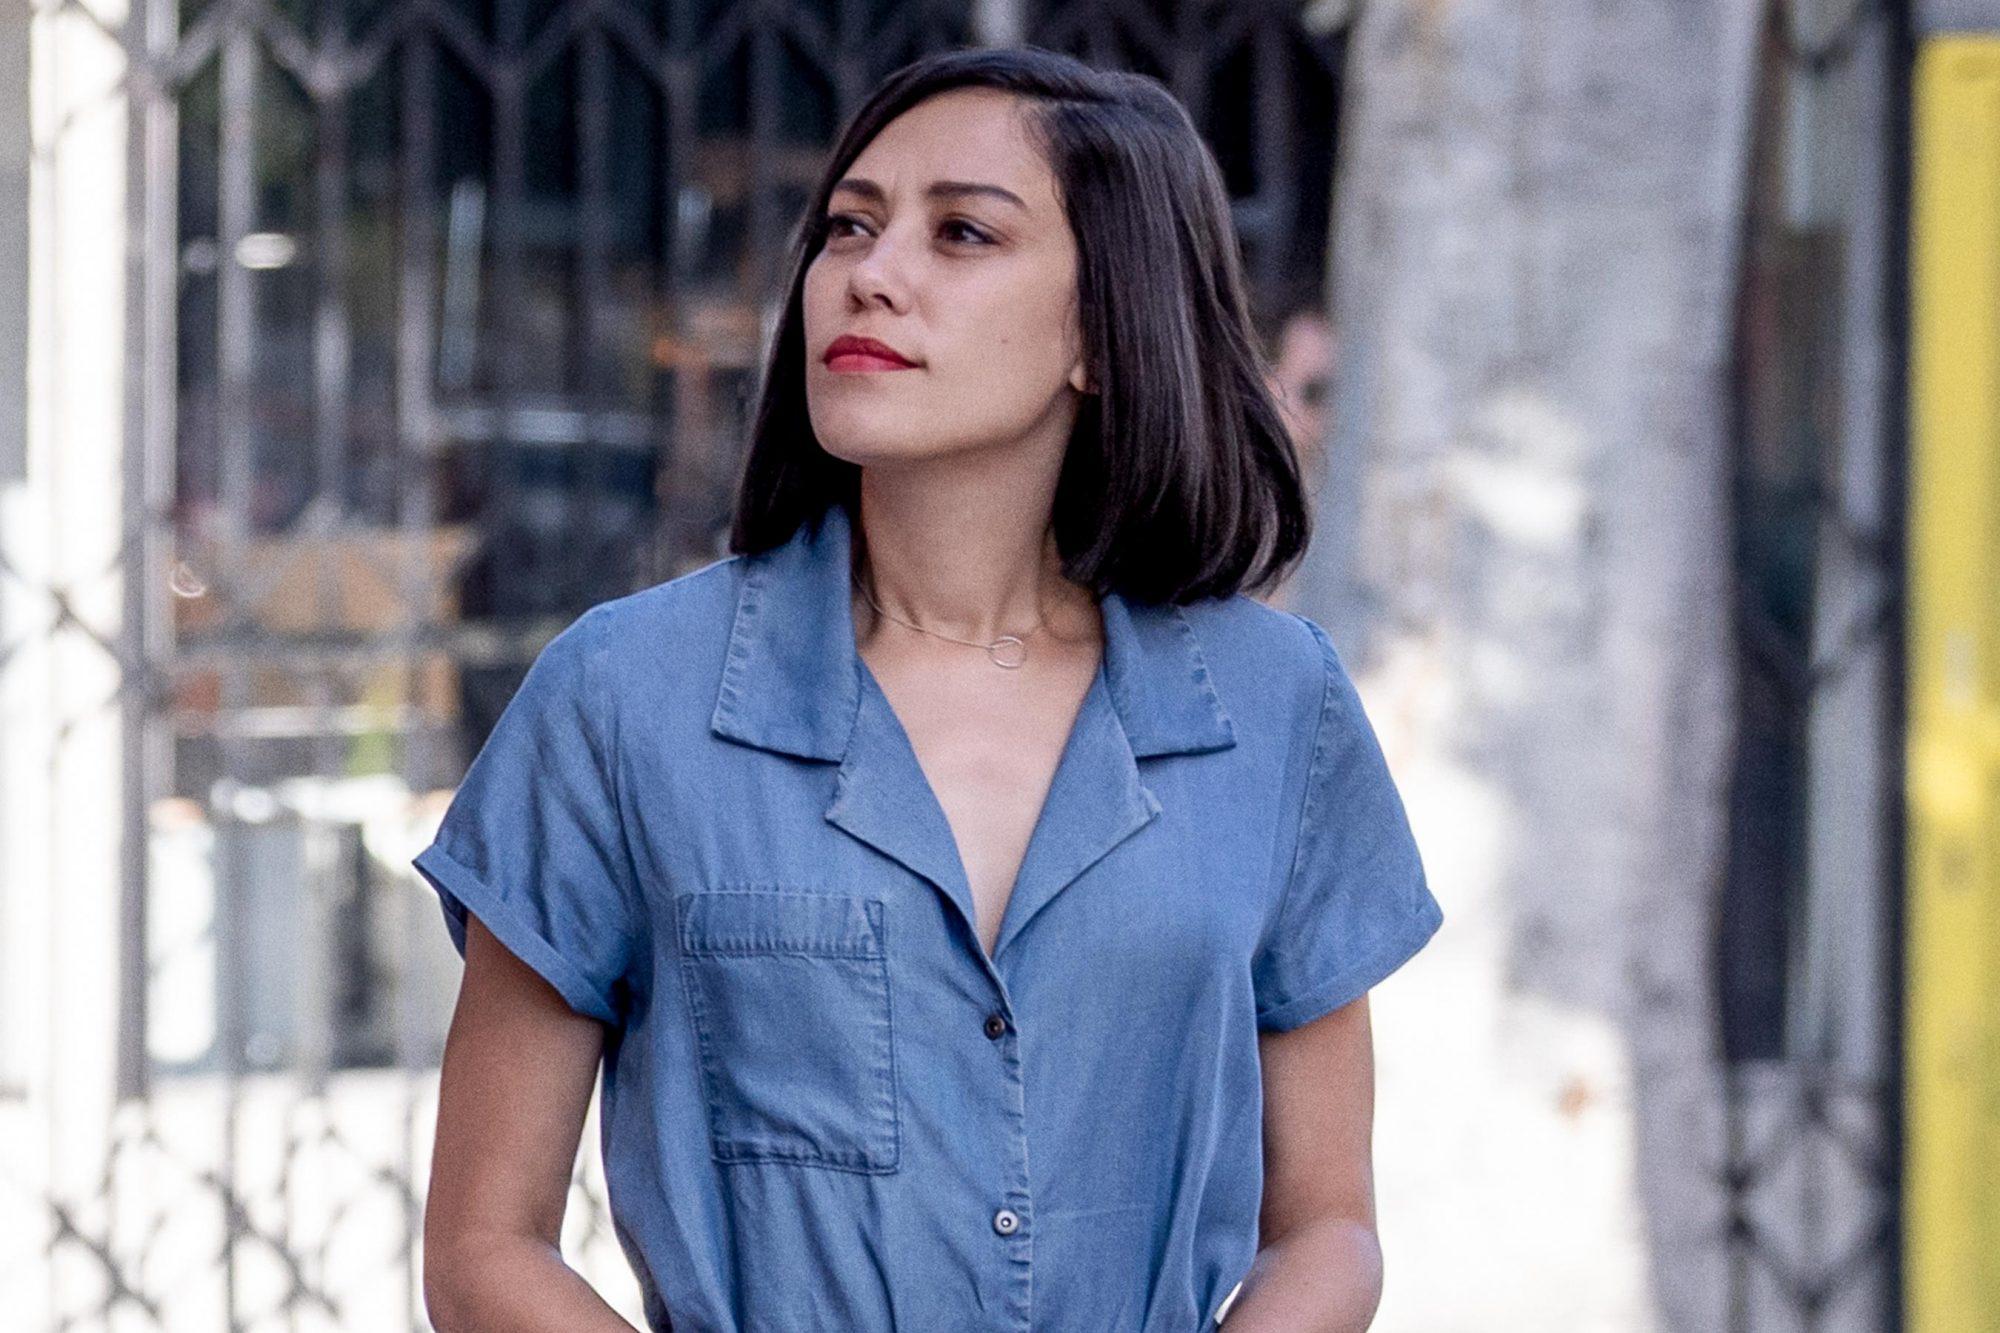 Vida Season 2, Episode 9 Mishel Prada as Emma CR: Kat Marcinowski/Starz